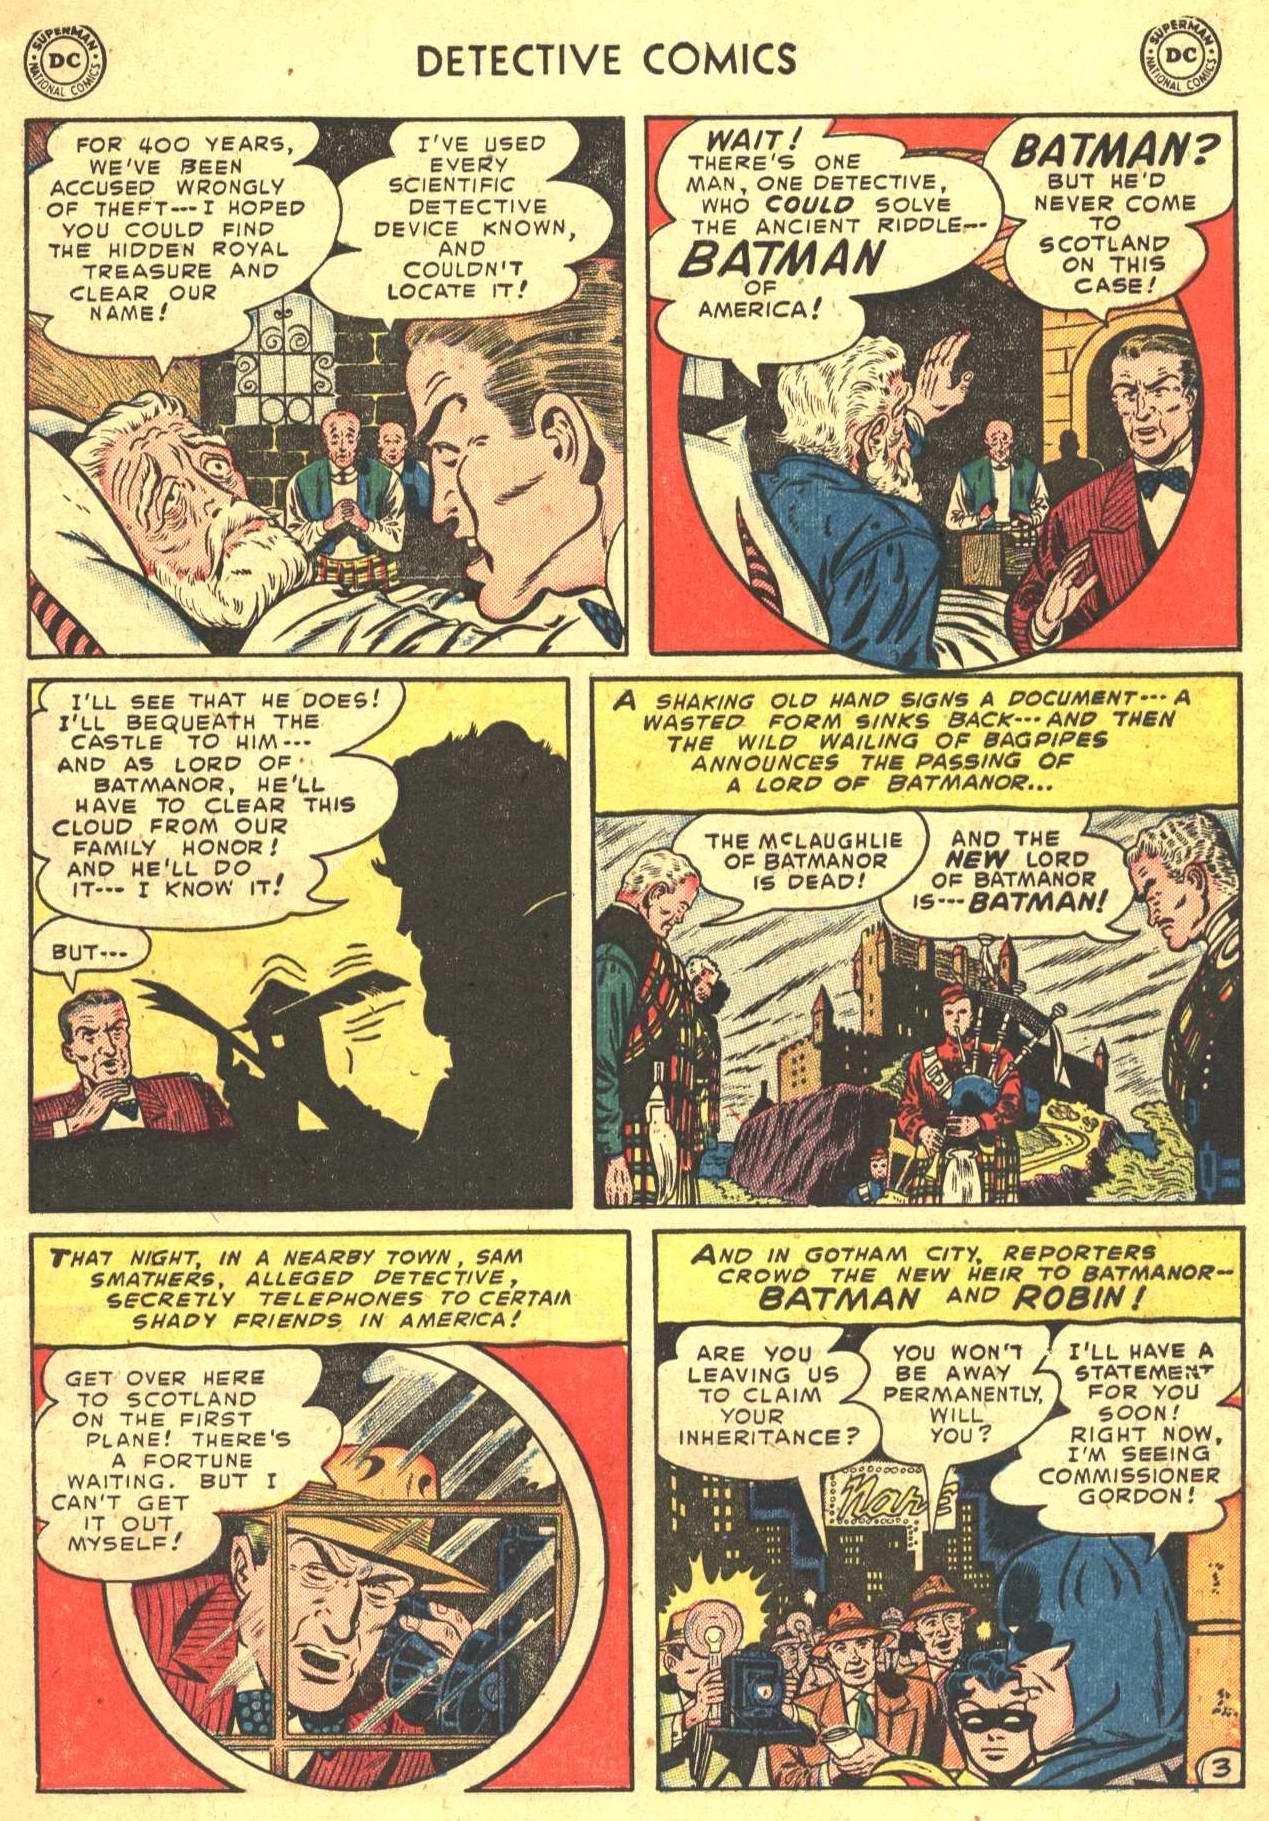 Detective Comics (1937) 198 Page 4